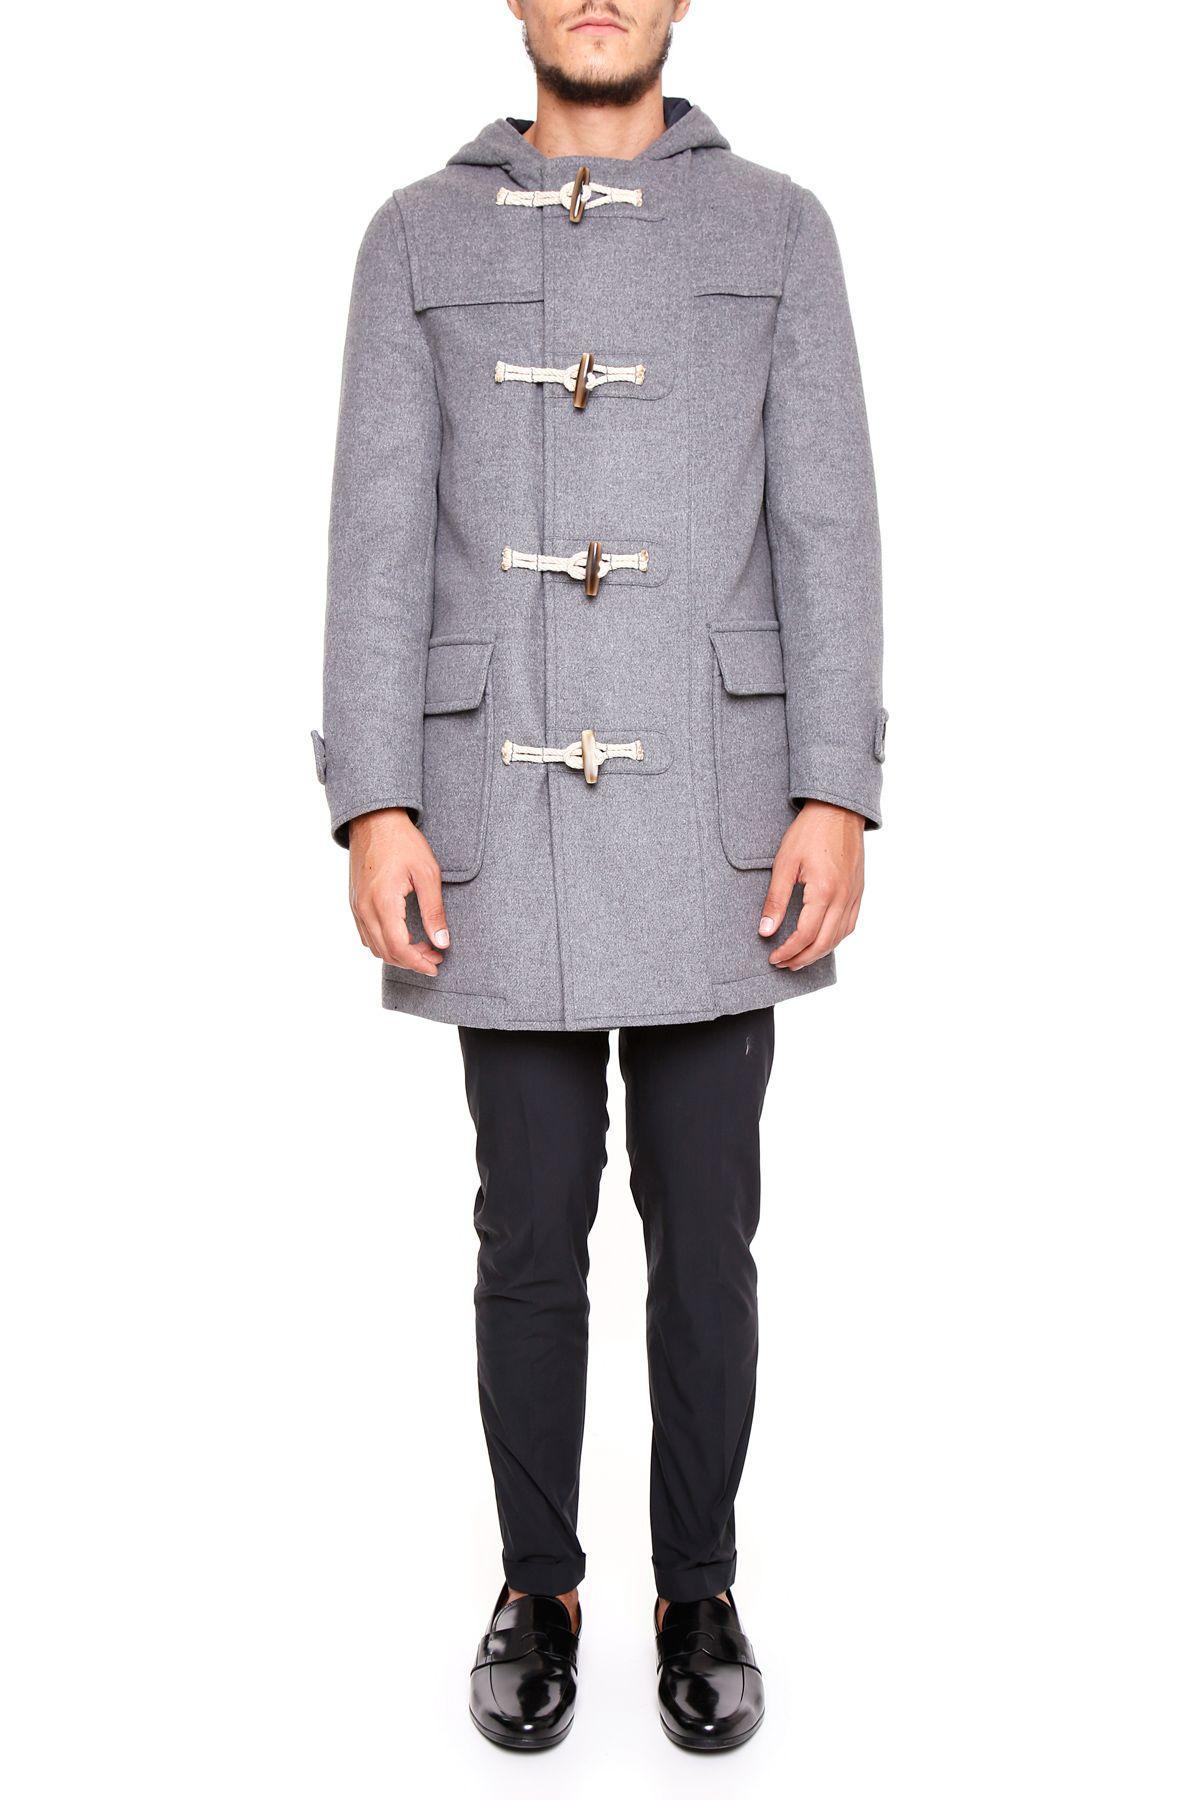 Rvr Lardini H321 Blue And Grey Sneaker In Leather And Technical Fabric In Grigiogrigio